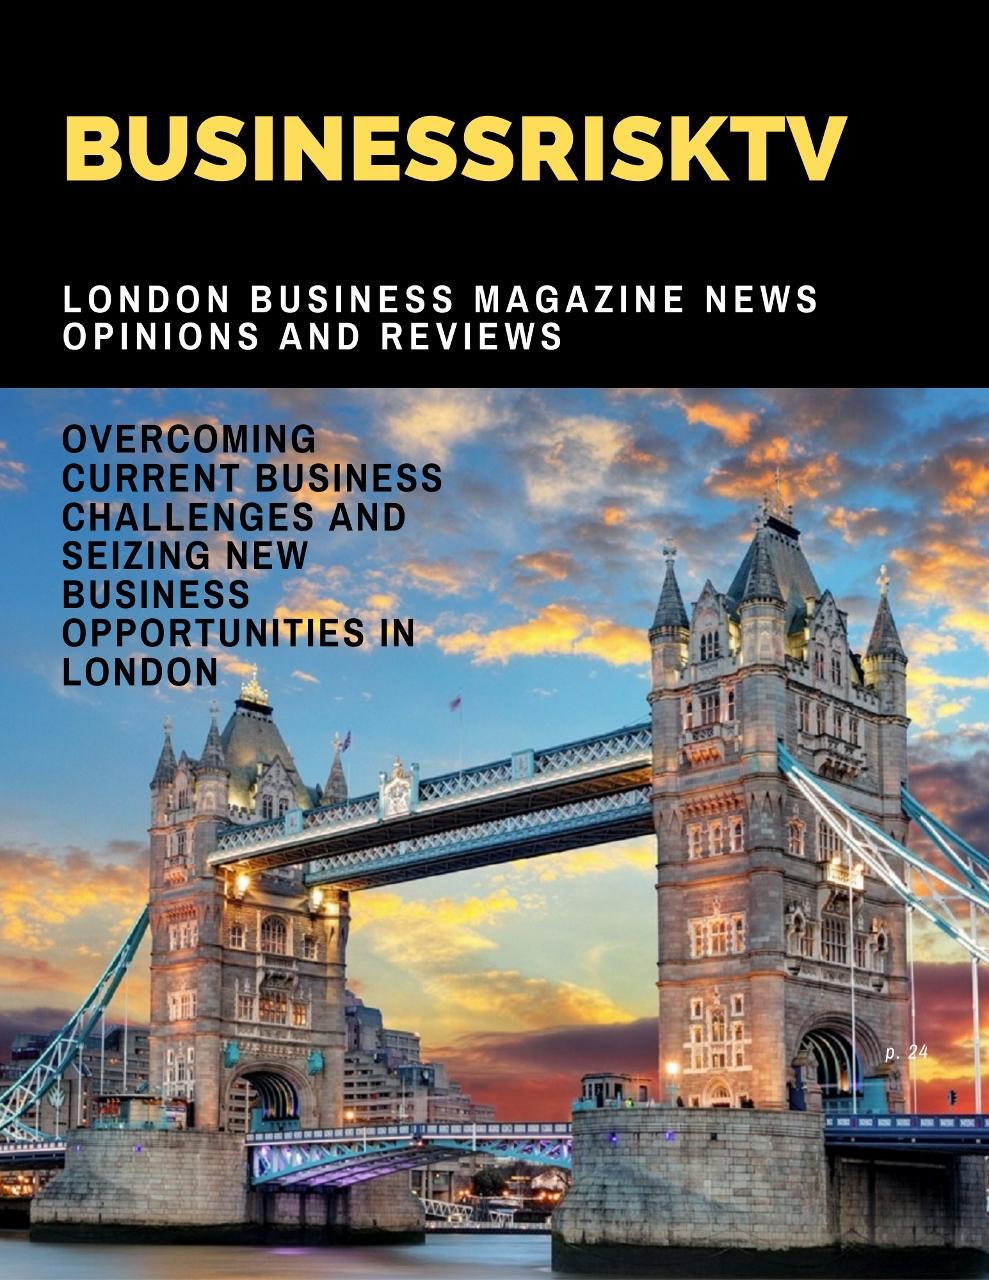 London Business Marketplace